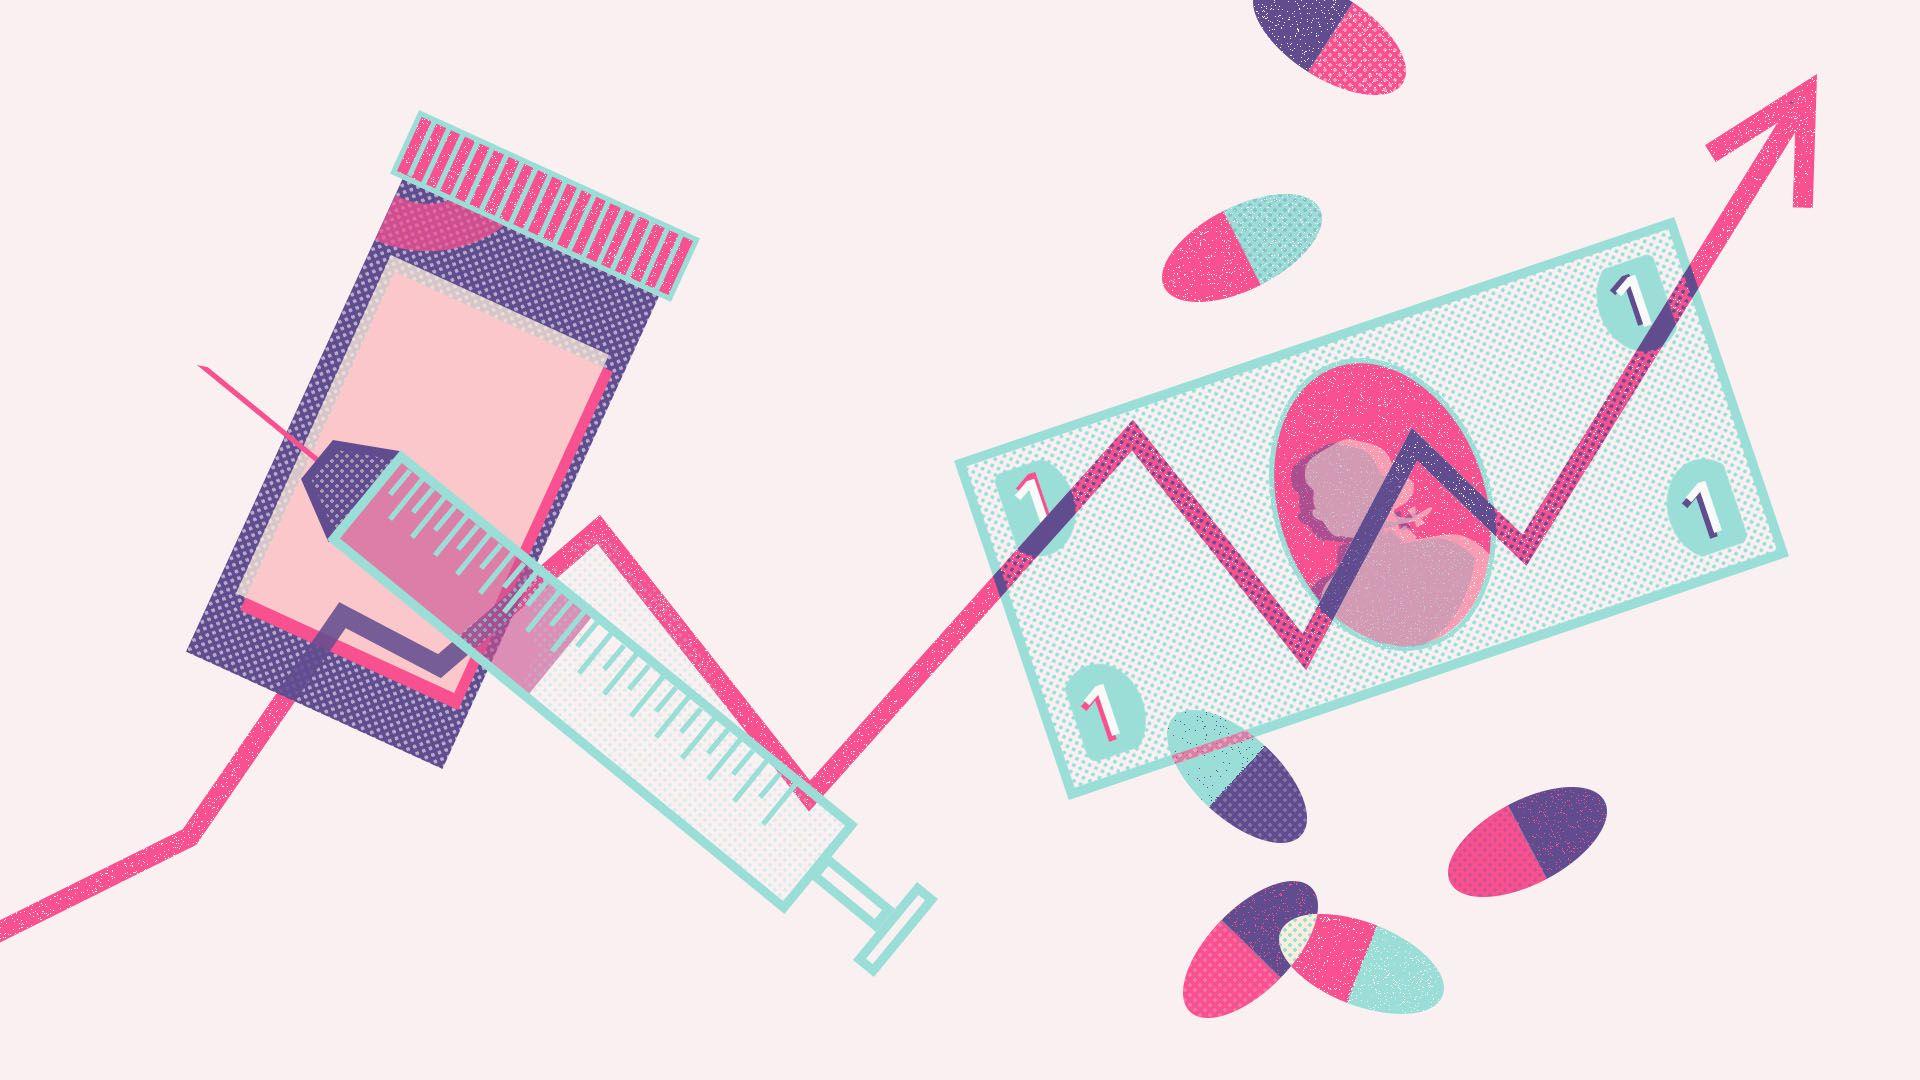 llustration of medication bottle, pills, dollar, syringe, and price arrow